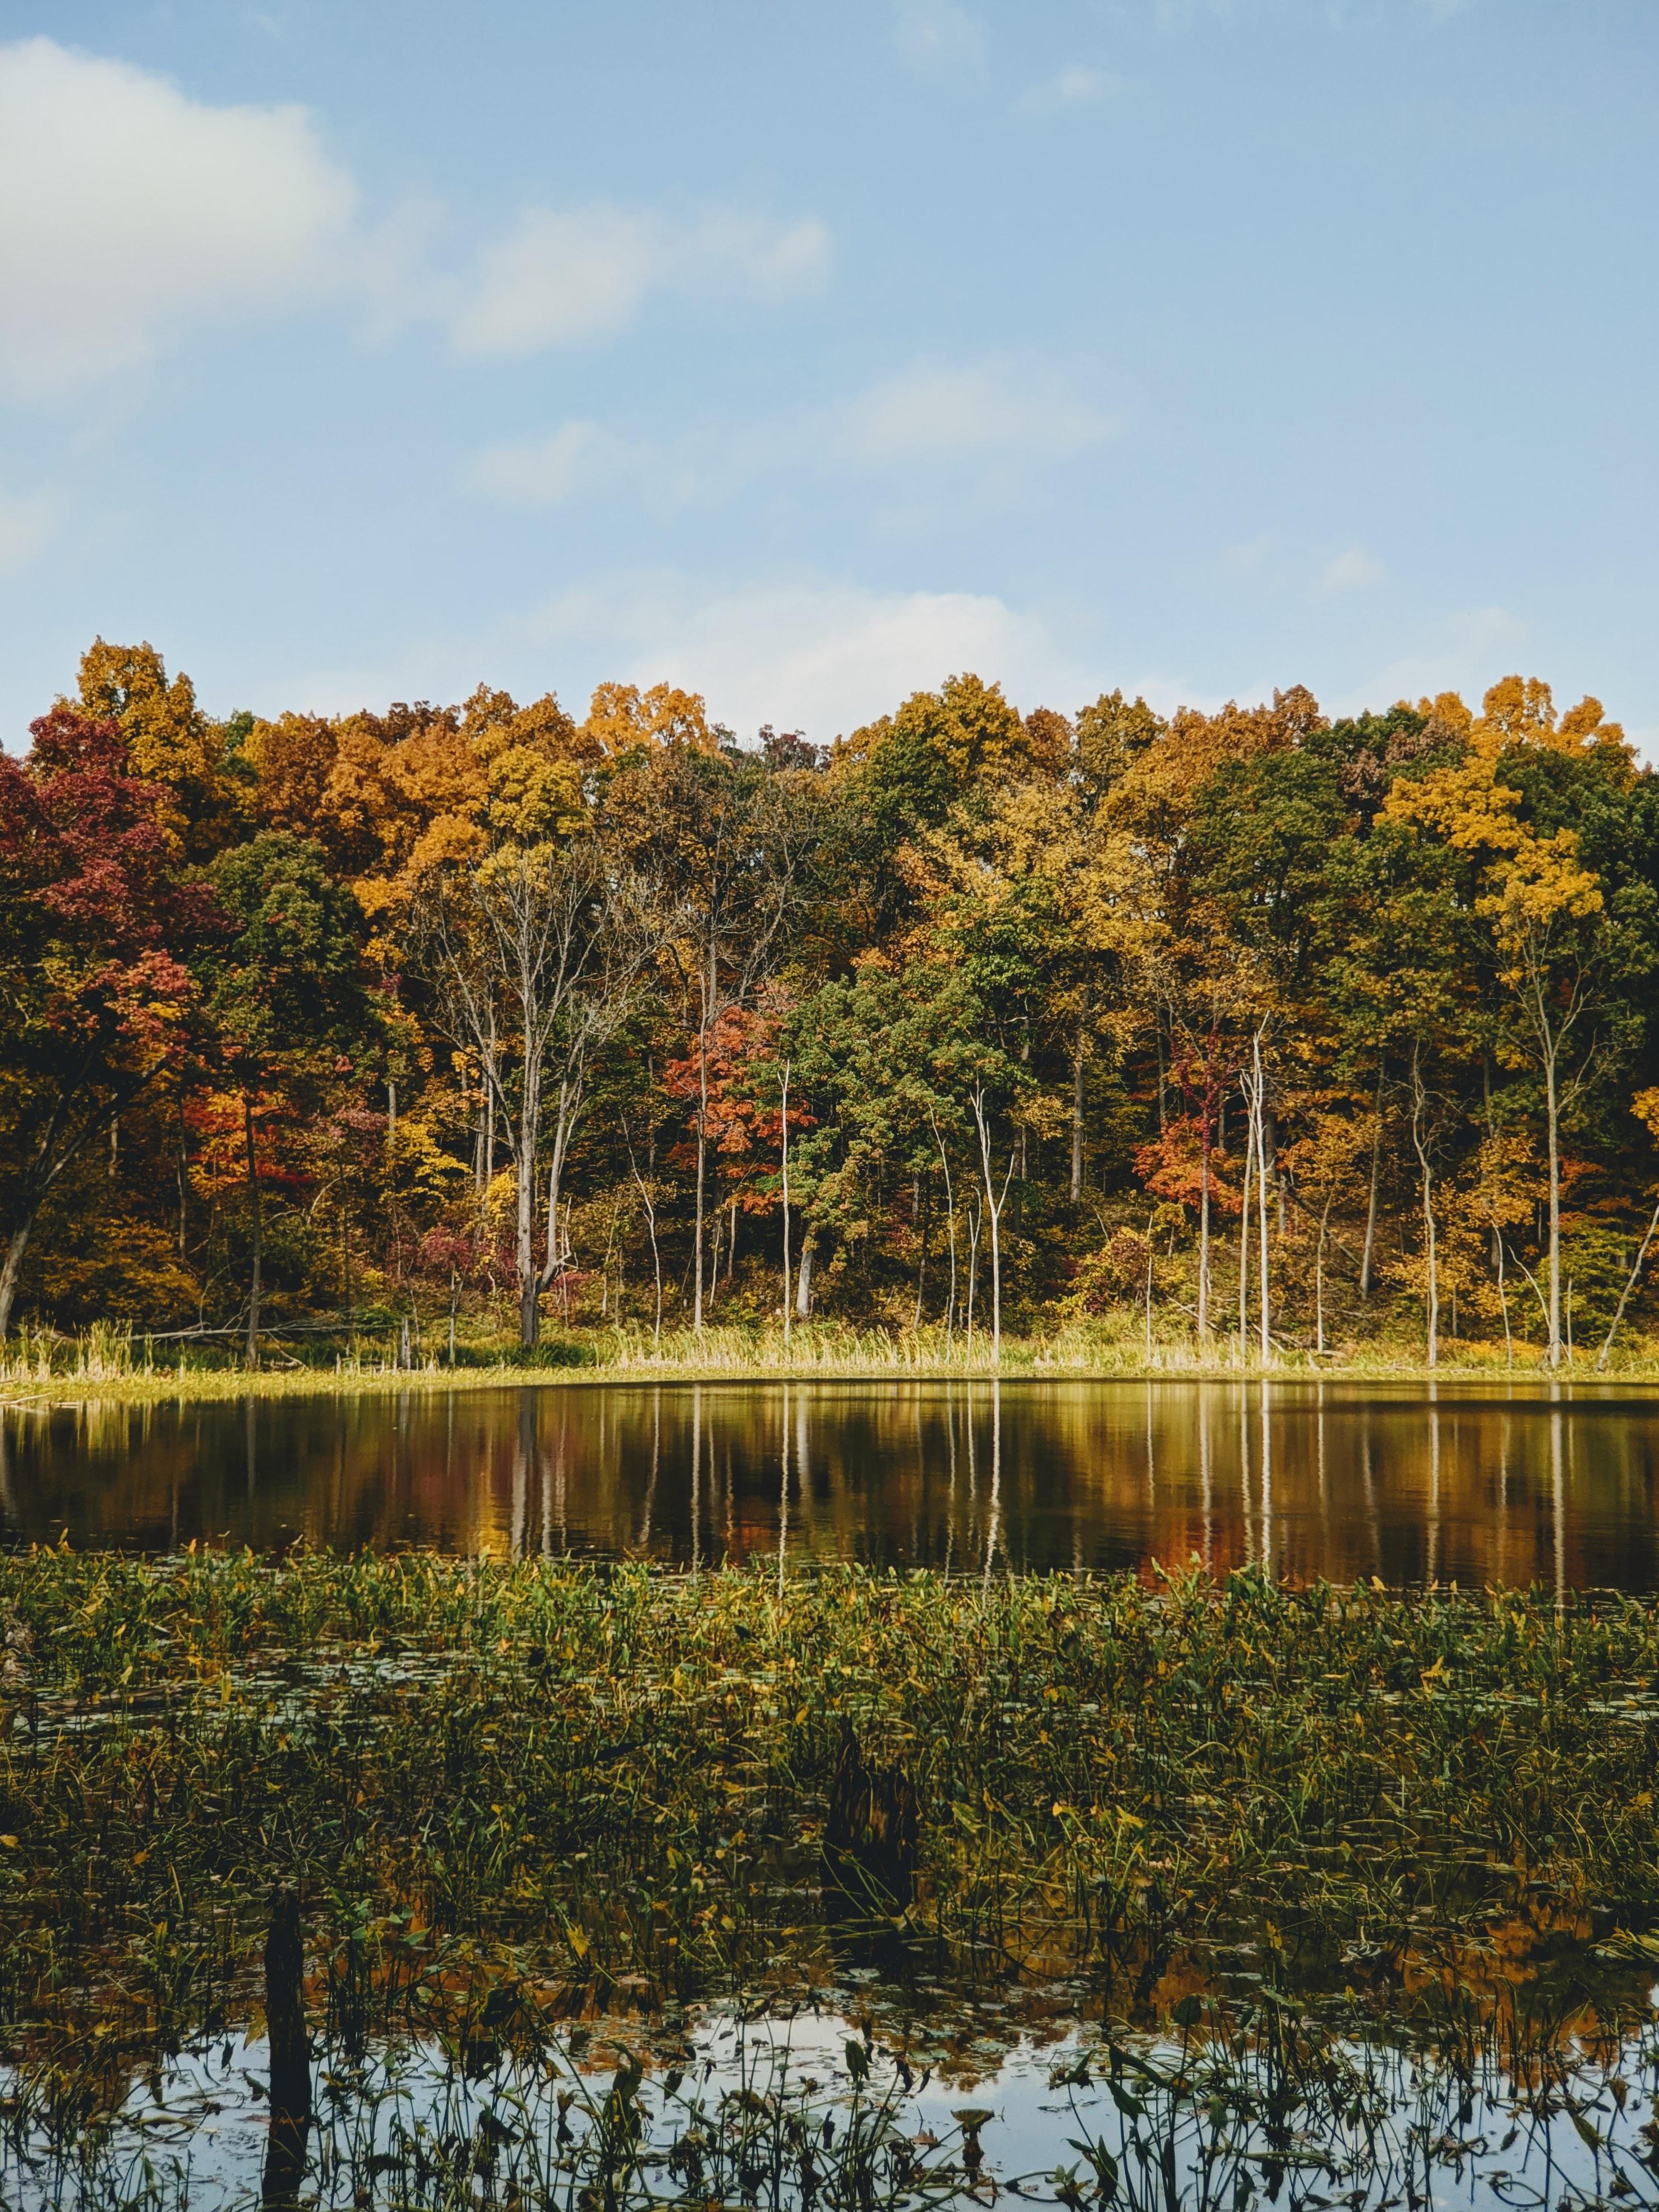 Autumn woods in Indiana